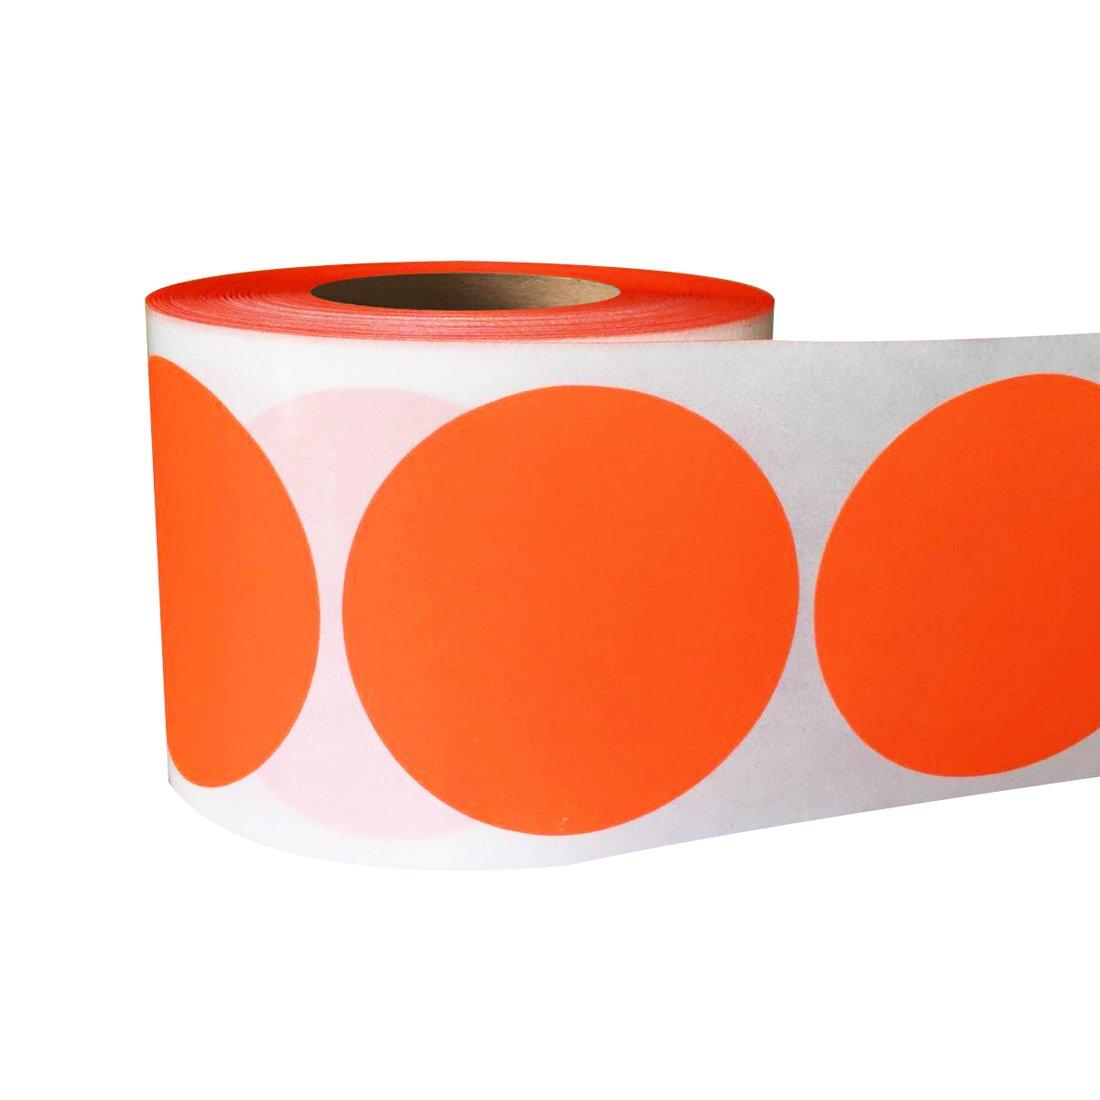 Smart Sticker 2' Inch Round Fluorescent red orange Color Coding Dot Labels - 500 Colored Circle Stickers Per Roll SMARSTICKER